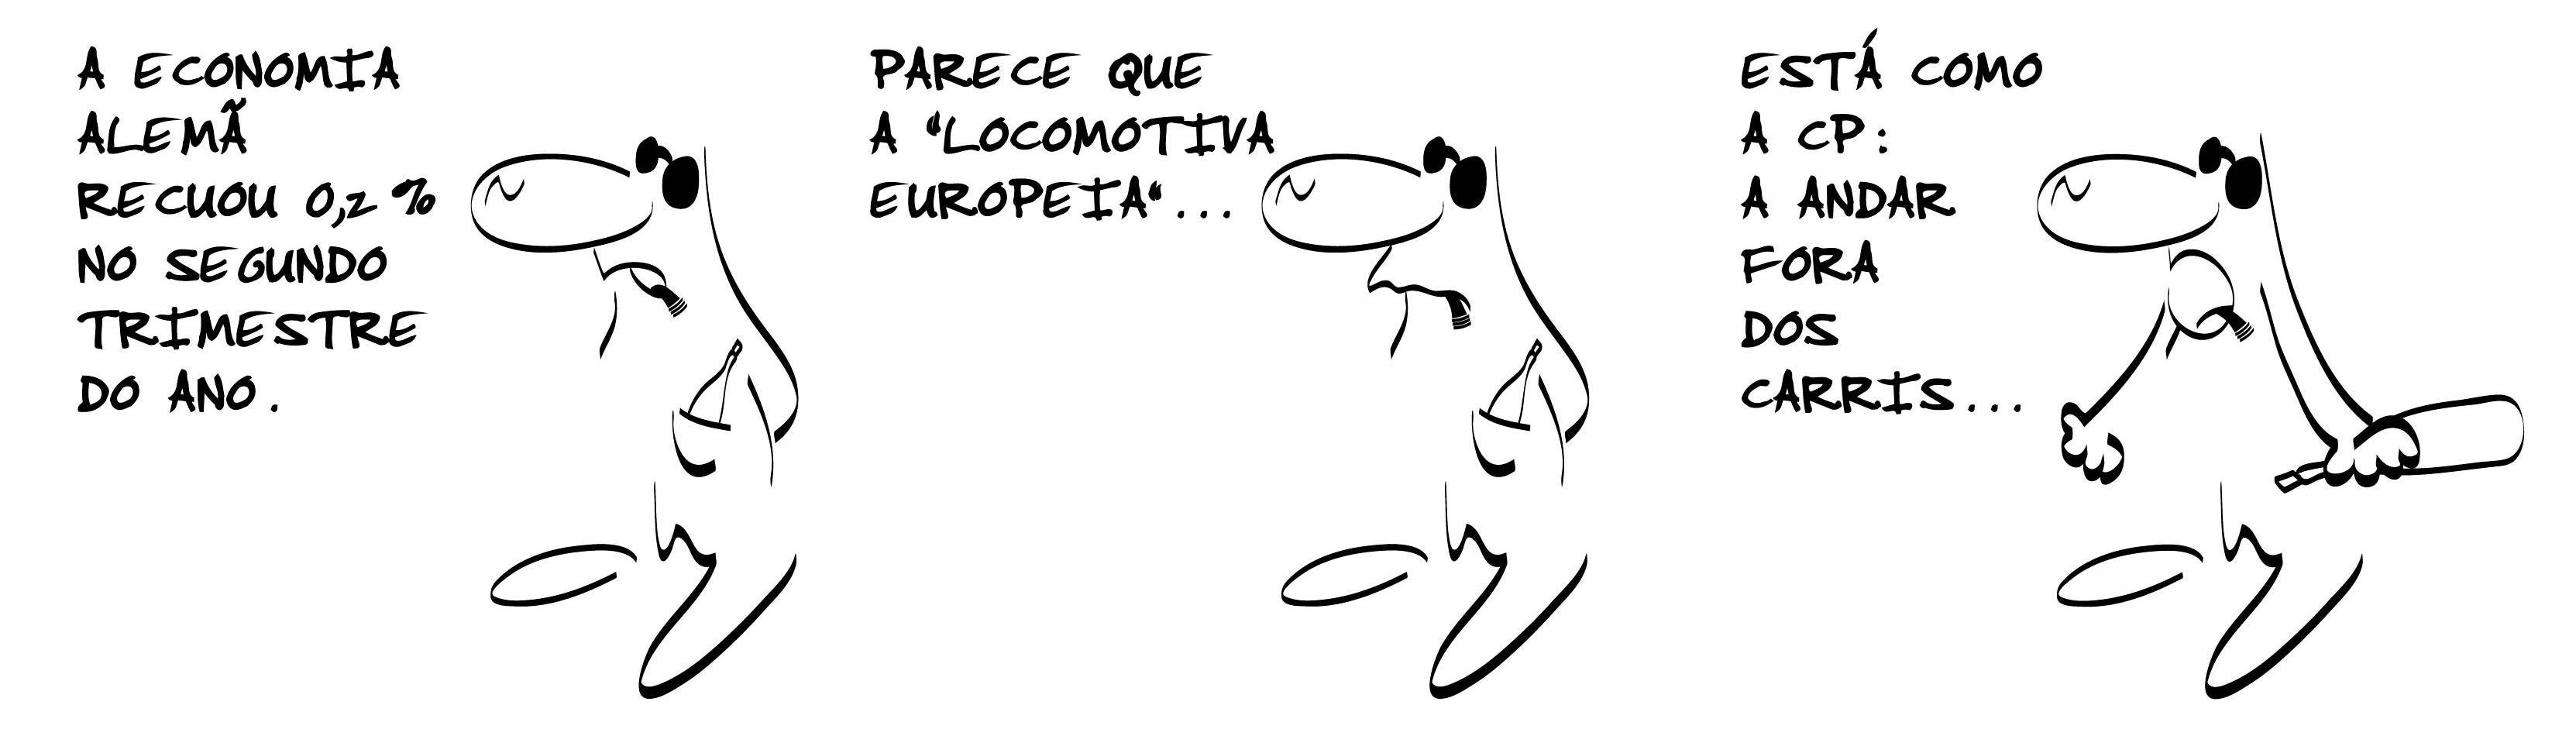 Cartoon de terça-feira, 2 de setembro de 2014